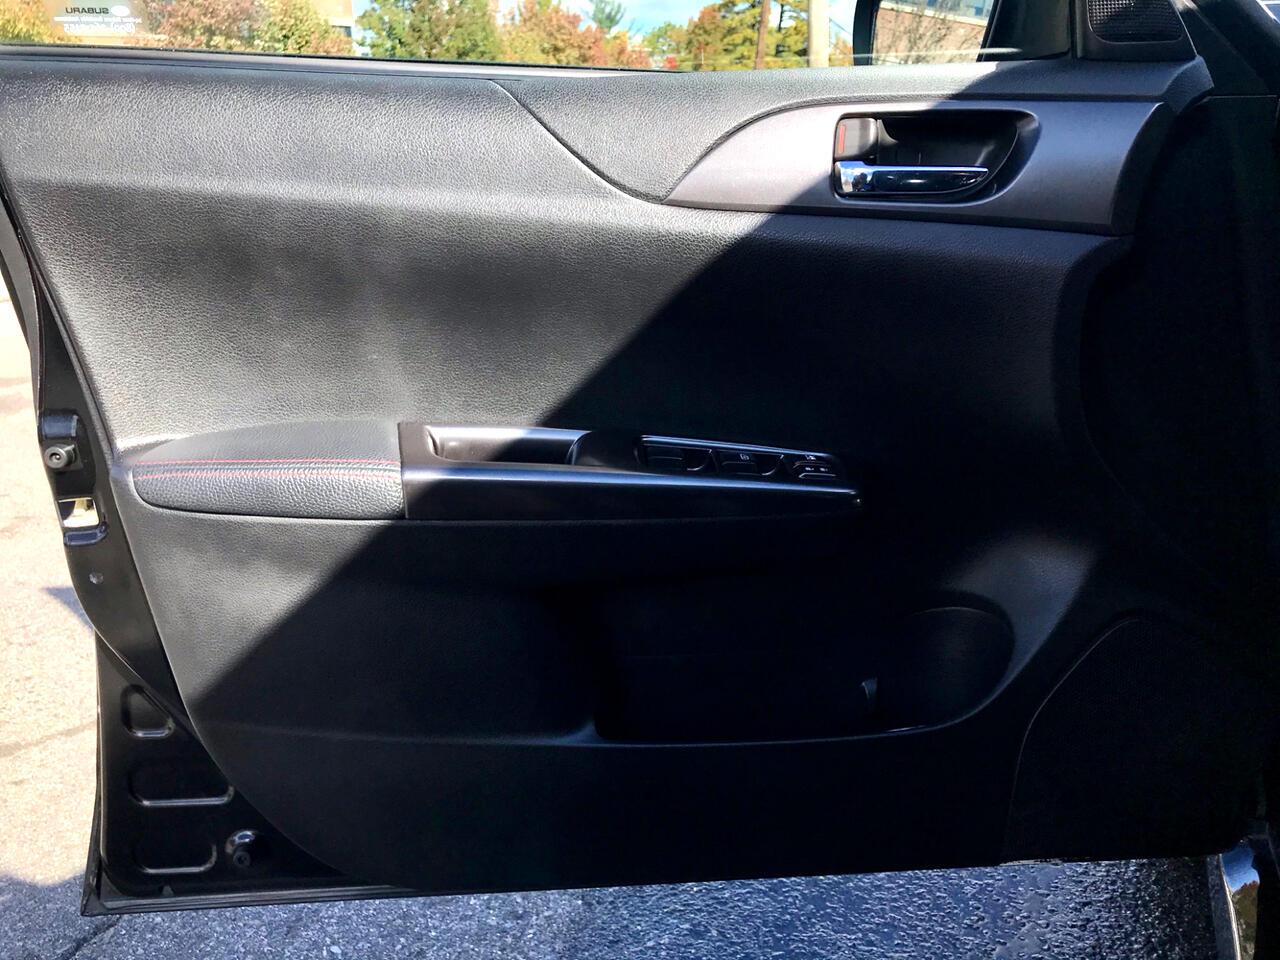 2011 Subaru Impreza WRX STI 4-Door